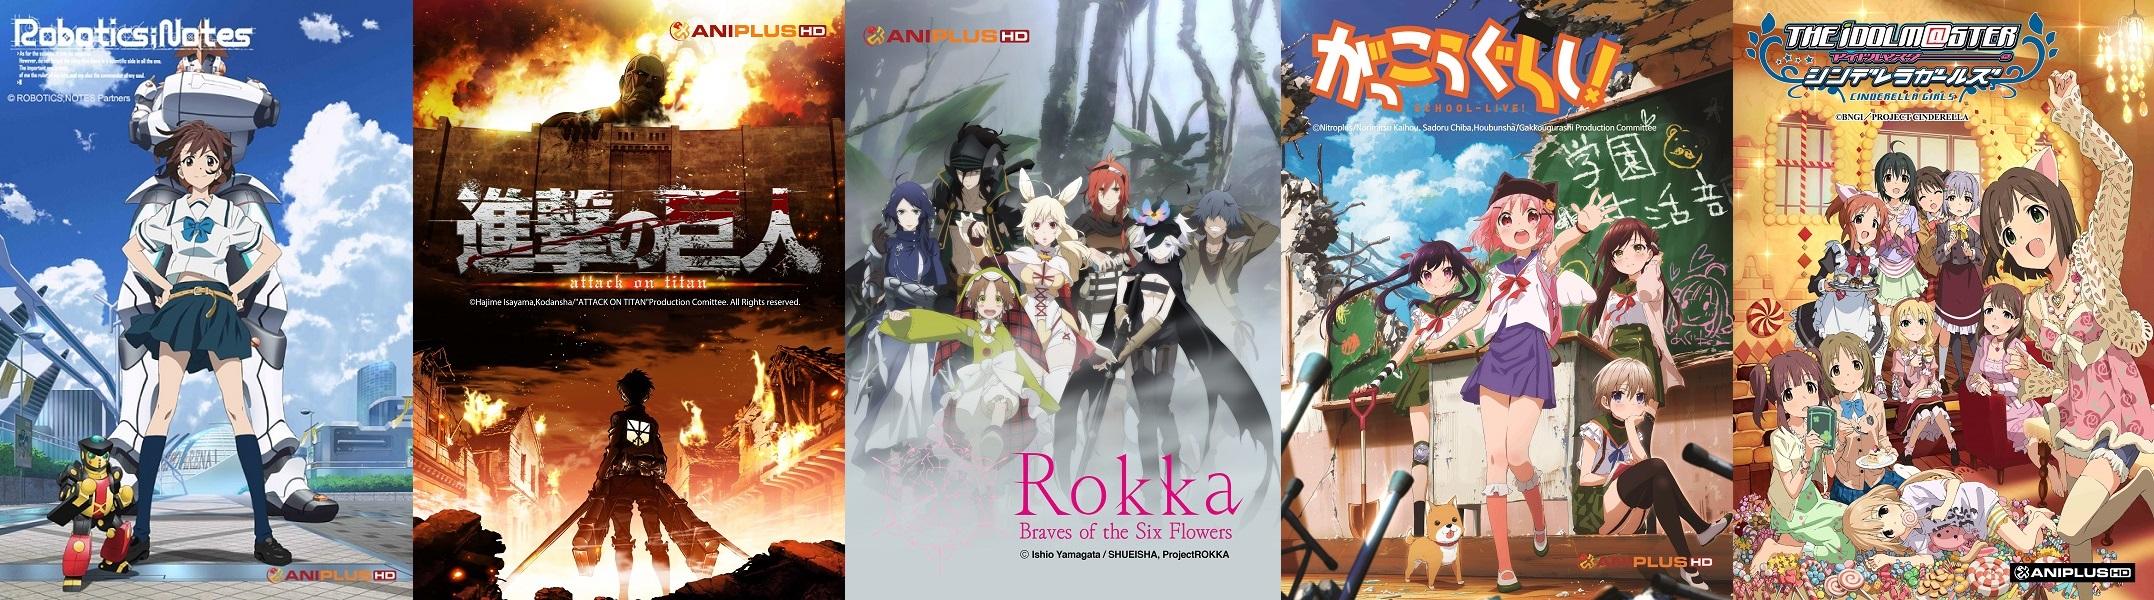 ANIPLUS August 2015 Anime Lineup